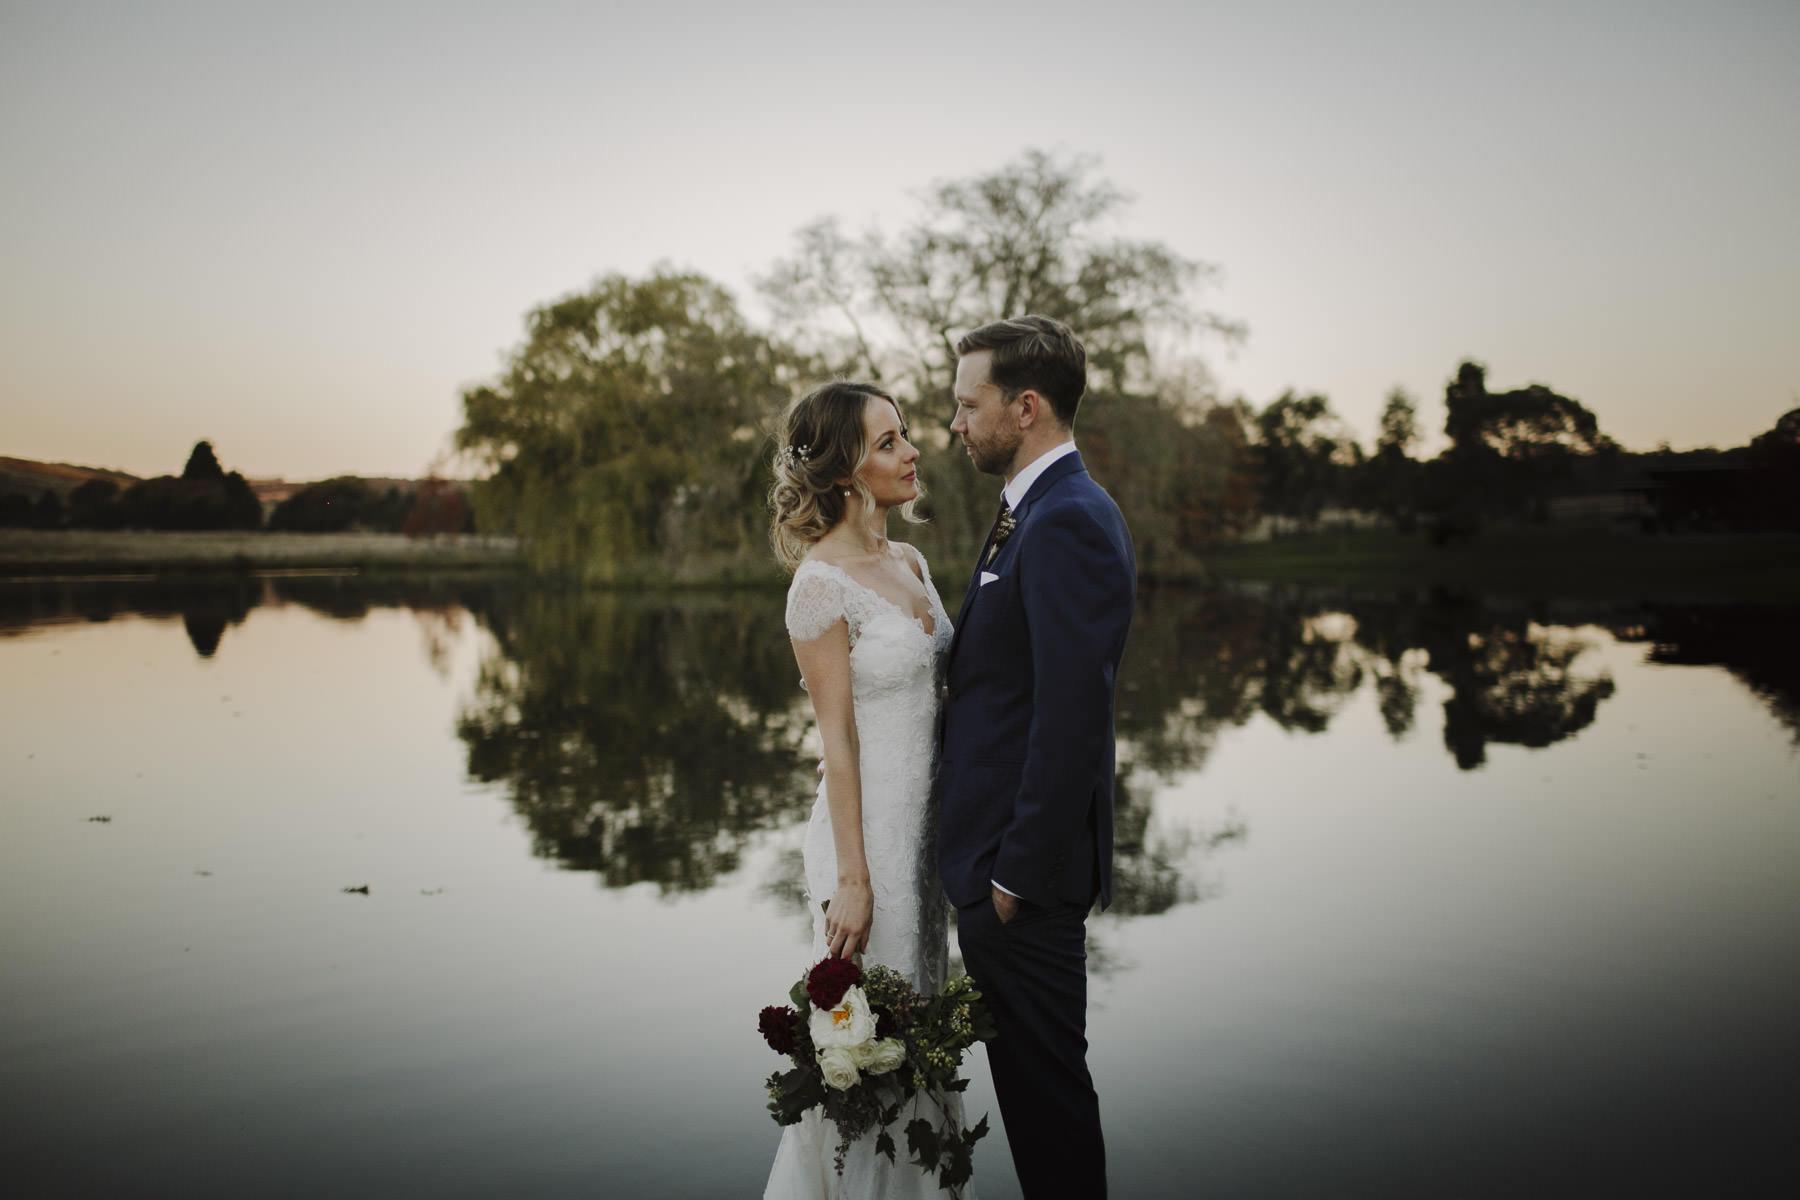 160506_justinaaron_wedding_holly_daniel_pr-208.jpg